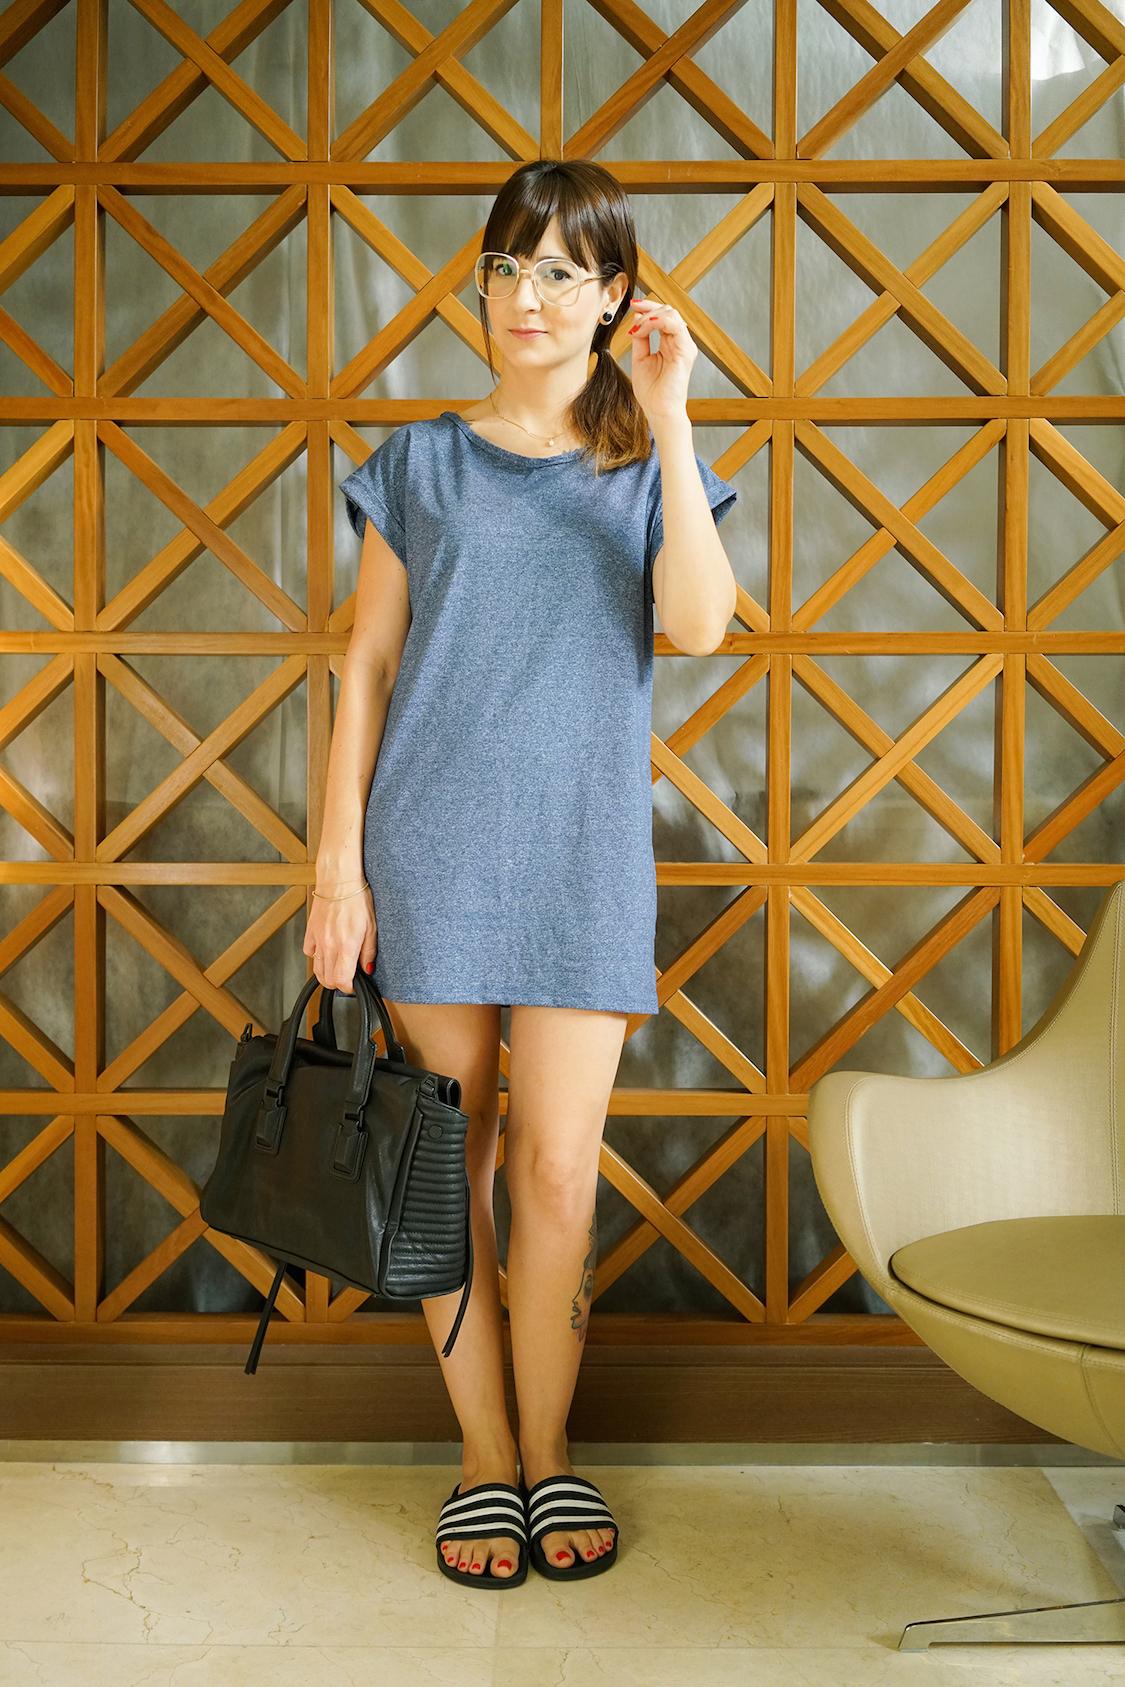 vestido-camiseta-look-aeroporto-brasilia-danielle-noce-1